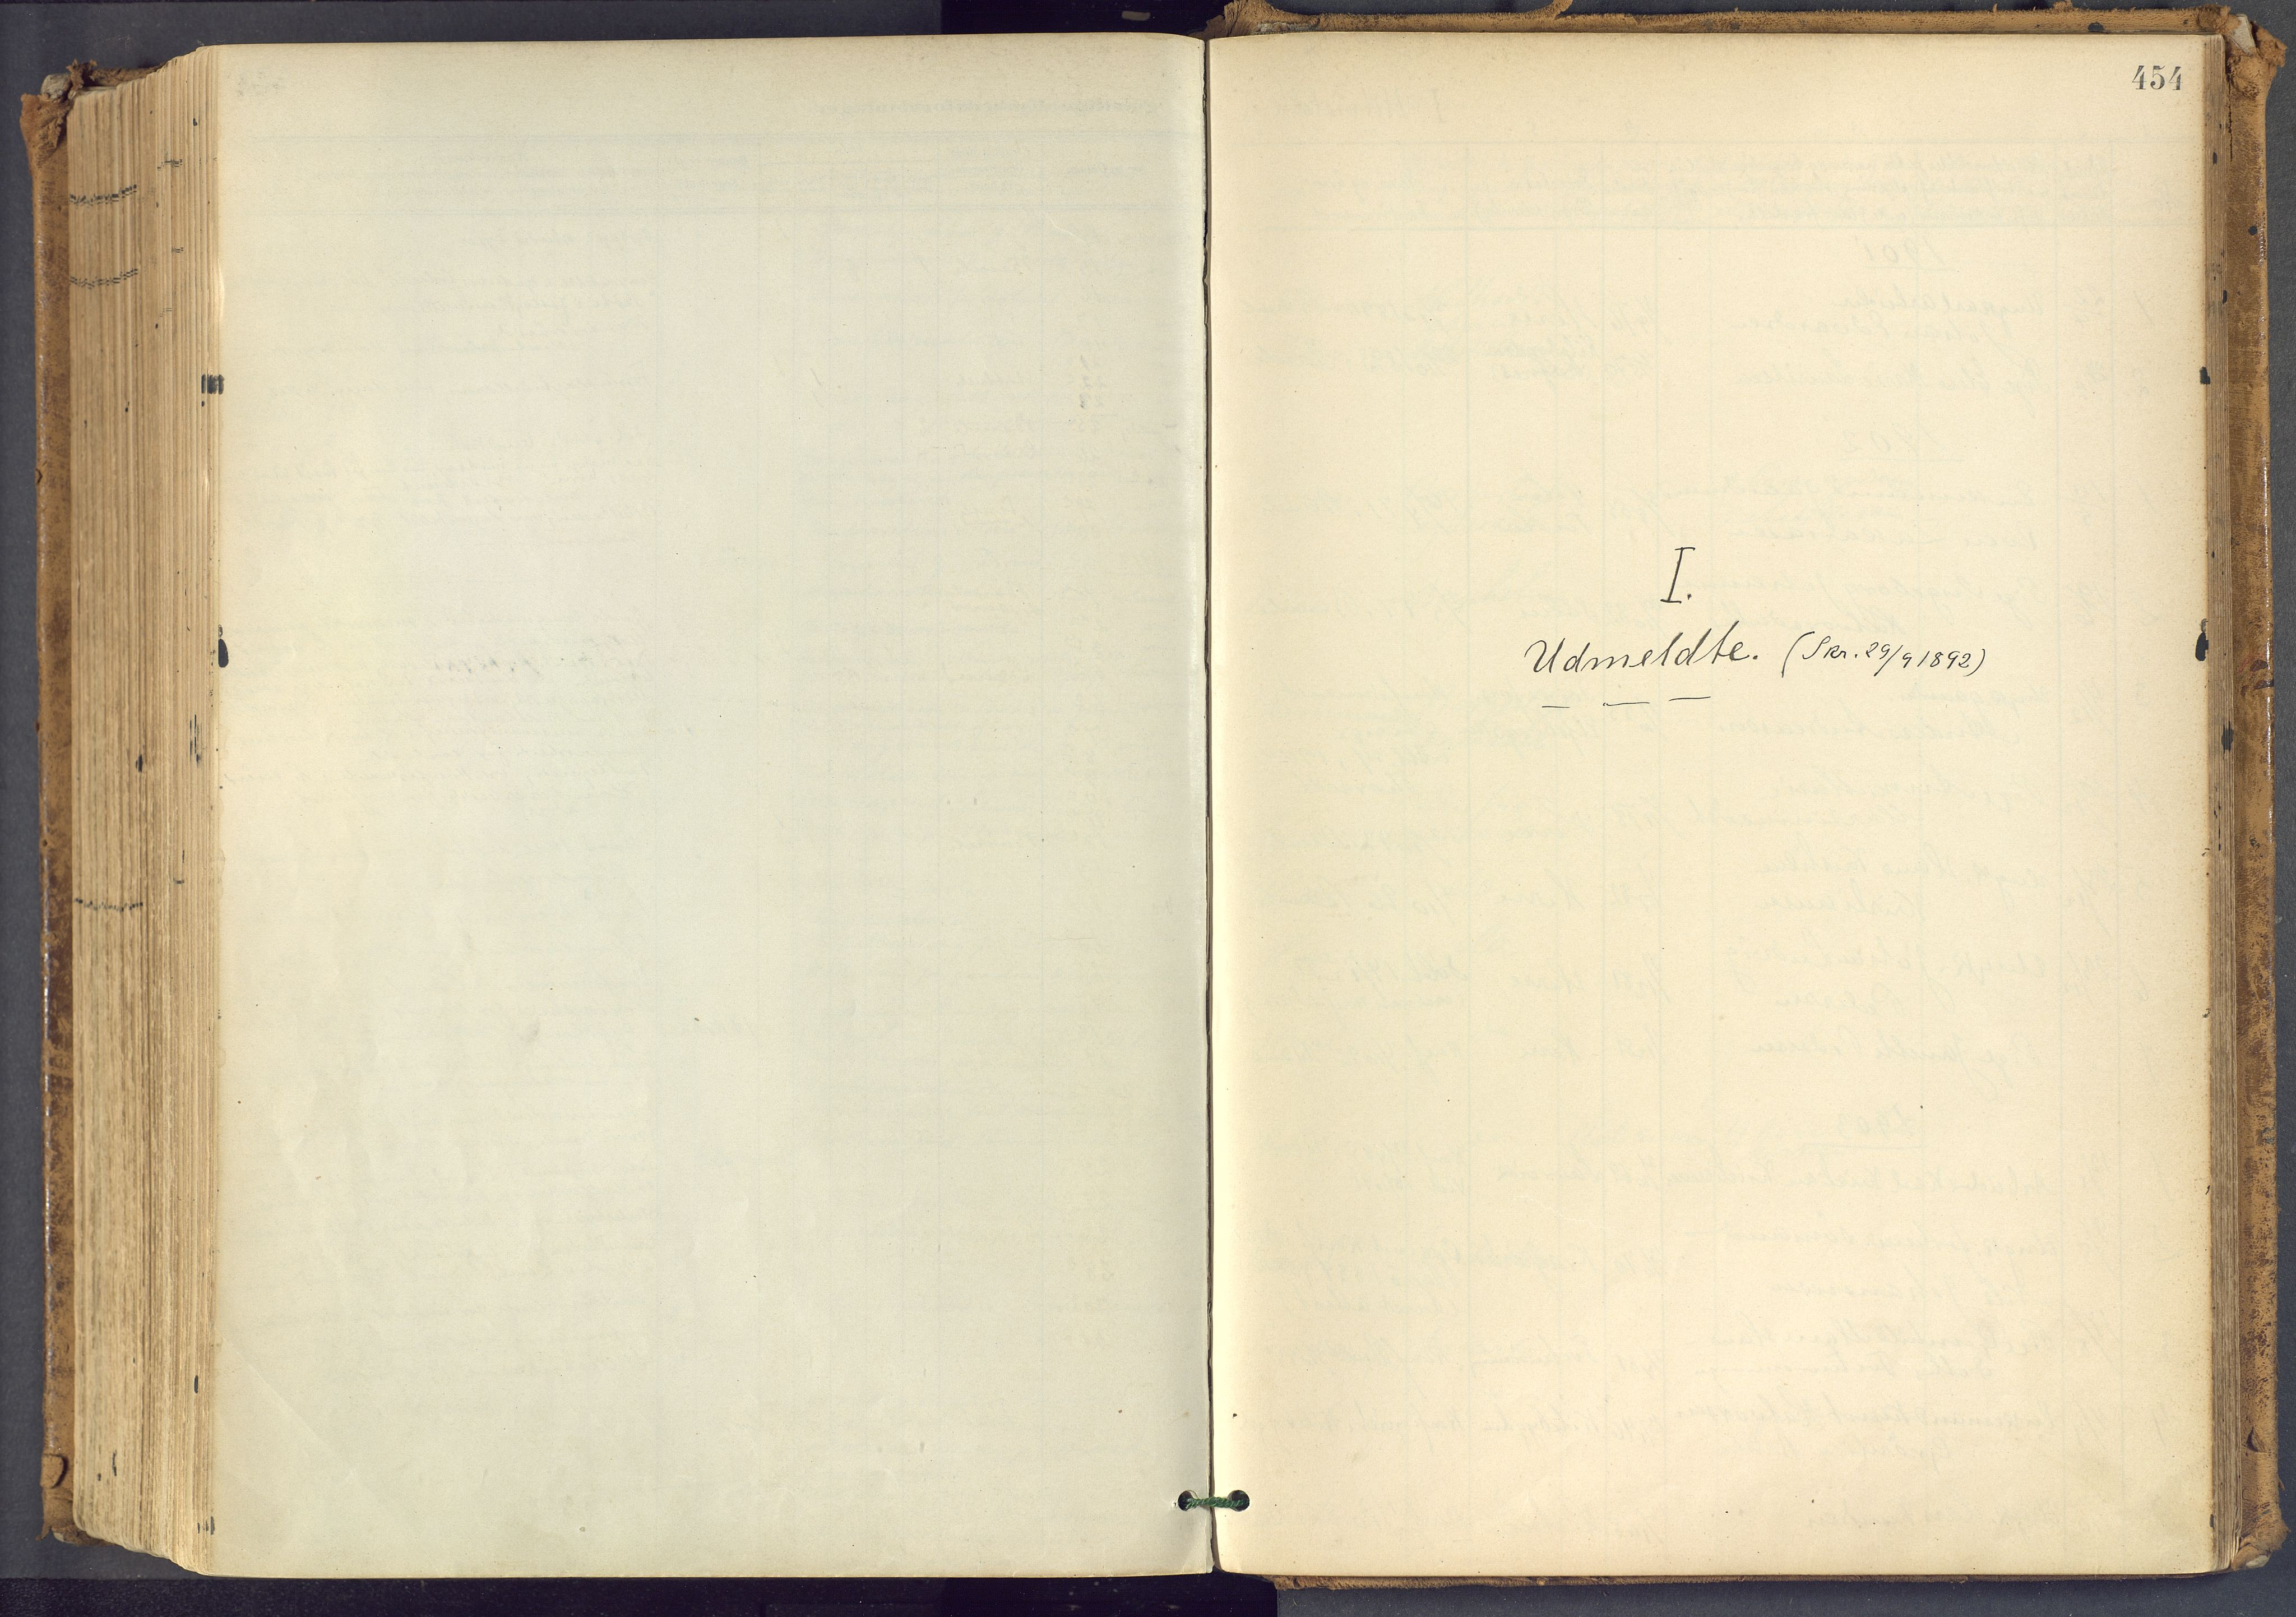 SAKO, Bamble kirkebøker, F/Fa/L0009: Ministerialbok nr. I 9, 1901-1917, s. 454